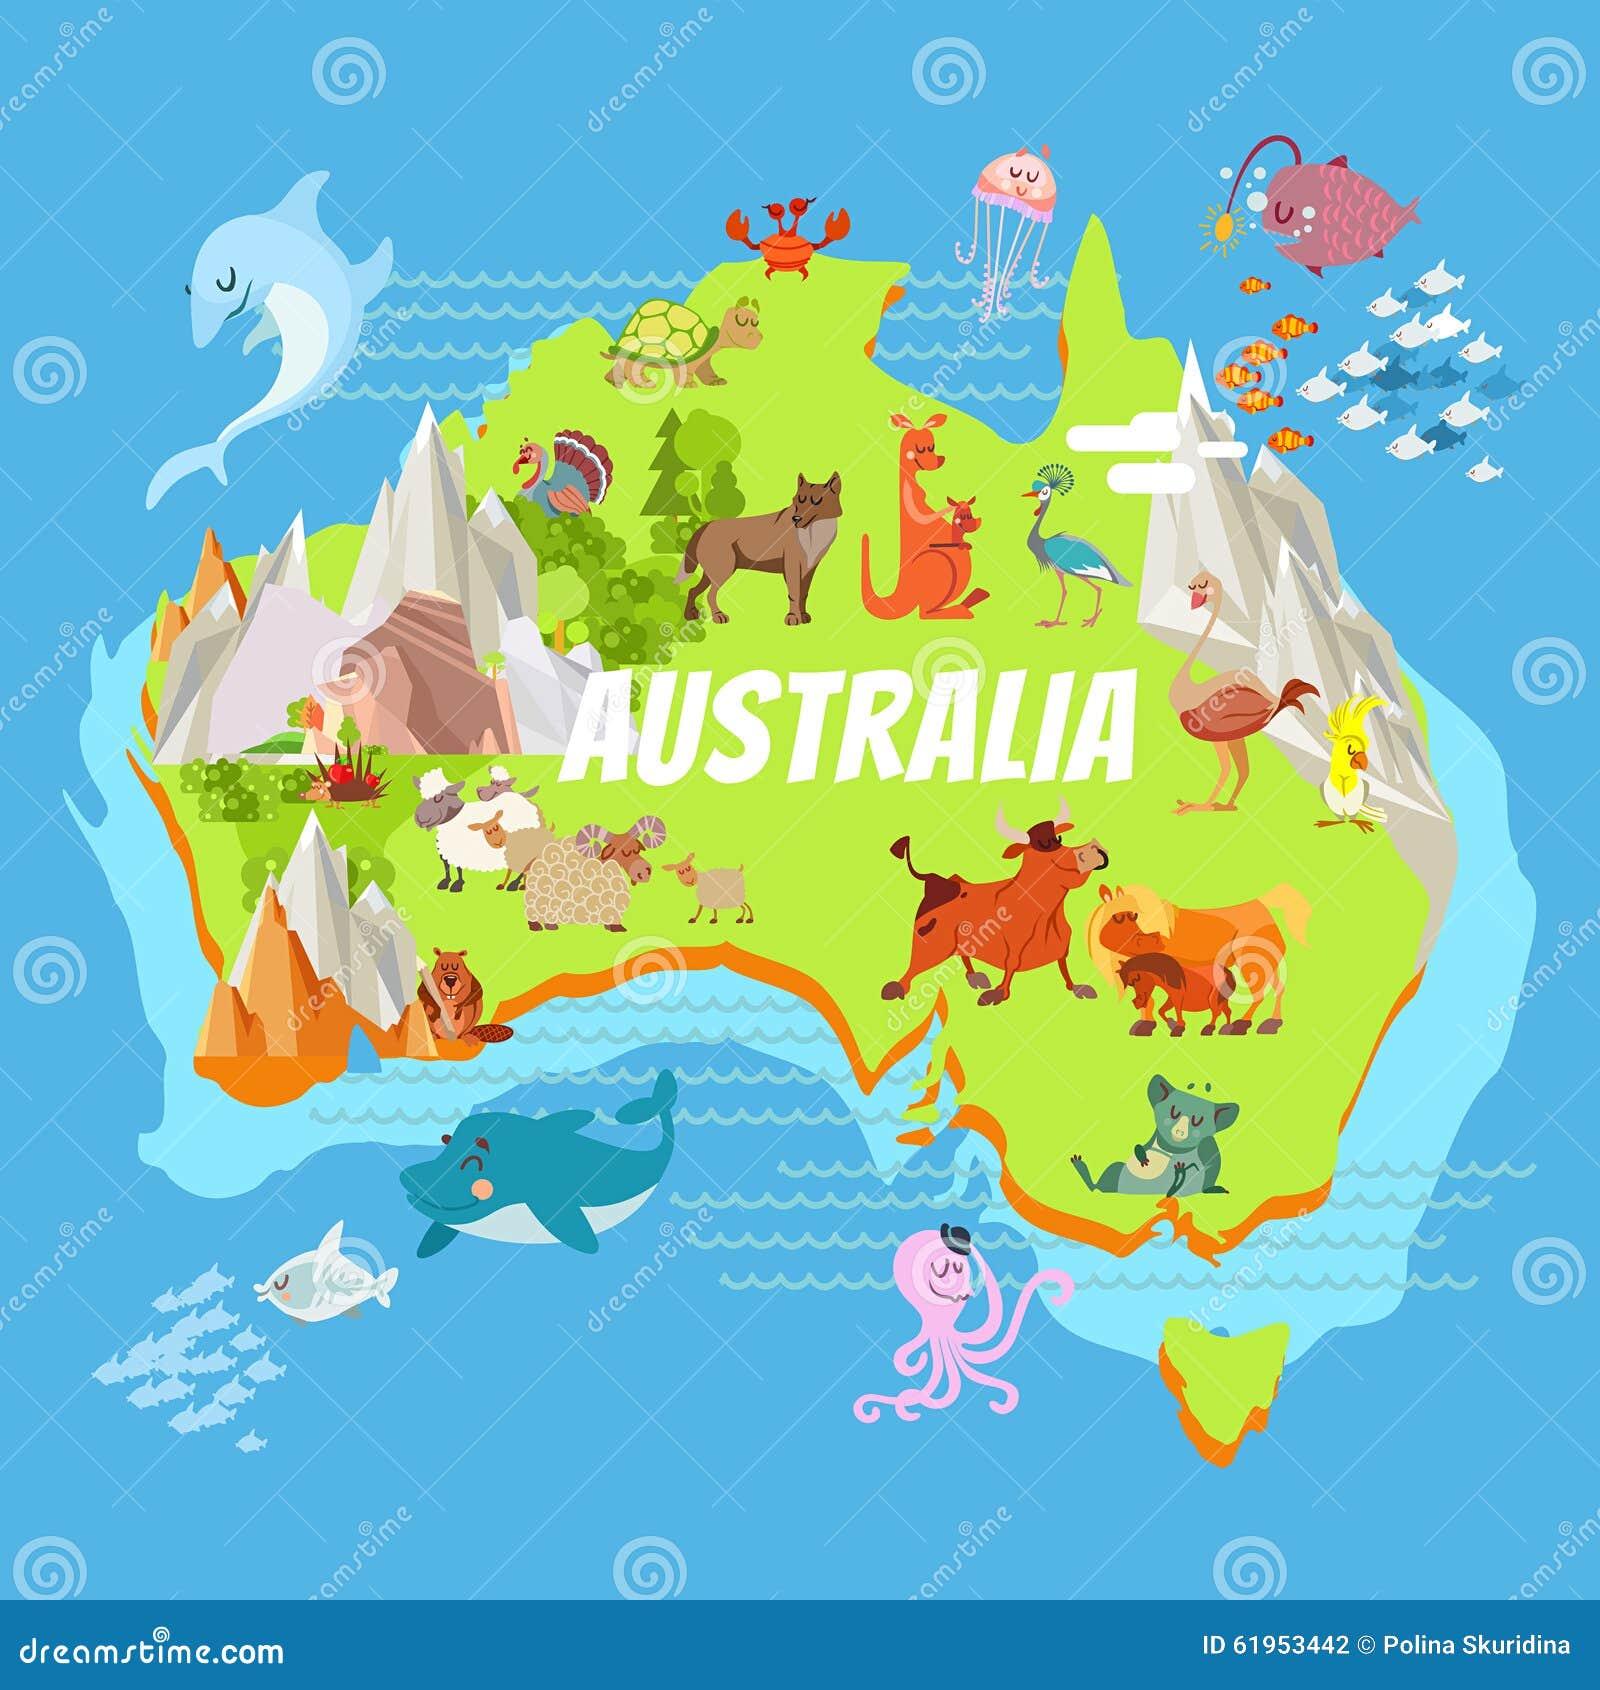 Map Of Australian Landscapes.Cartoon Australia Map With Animals Stock Vector Illustration Of